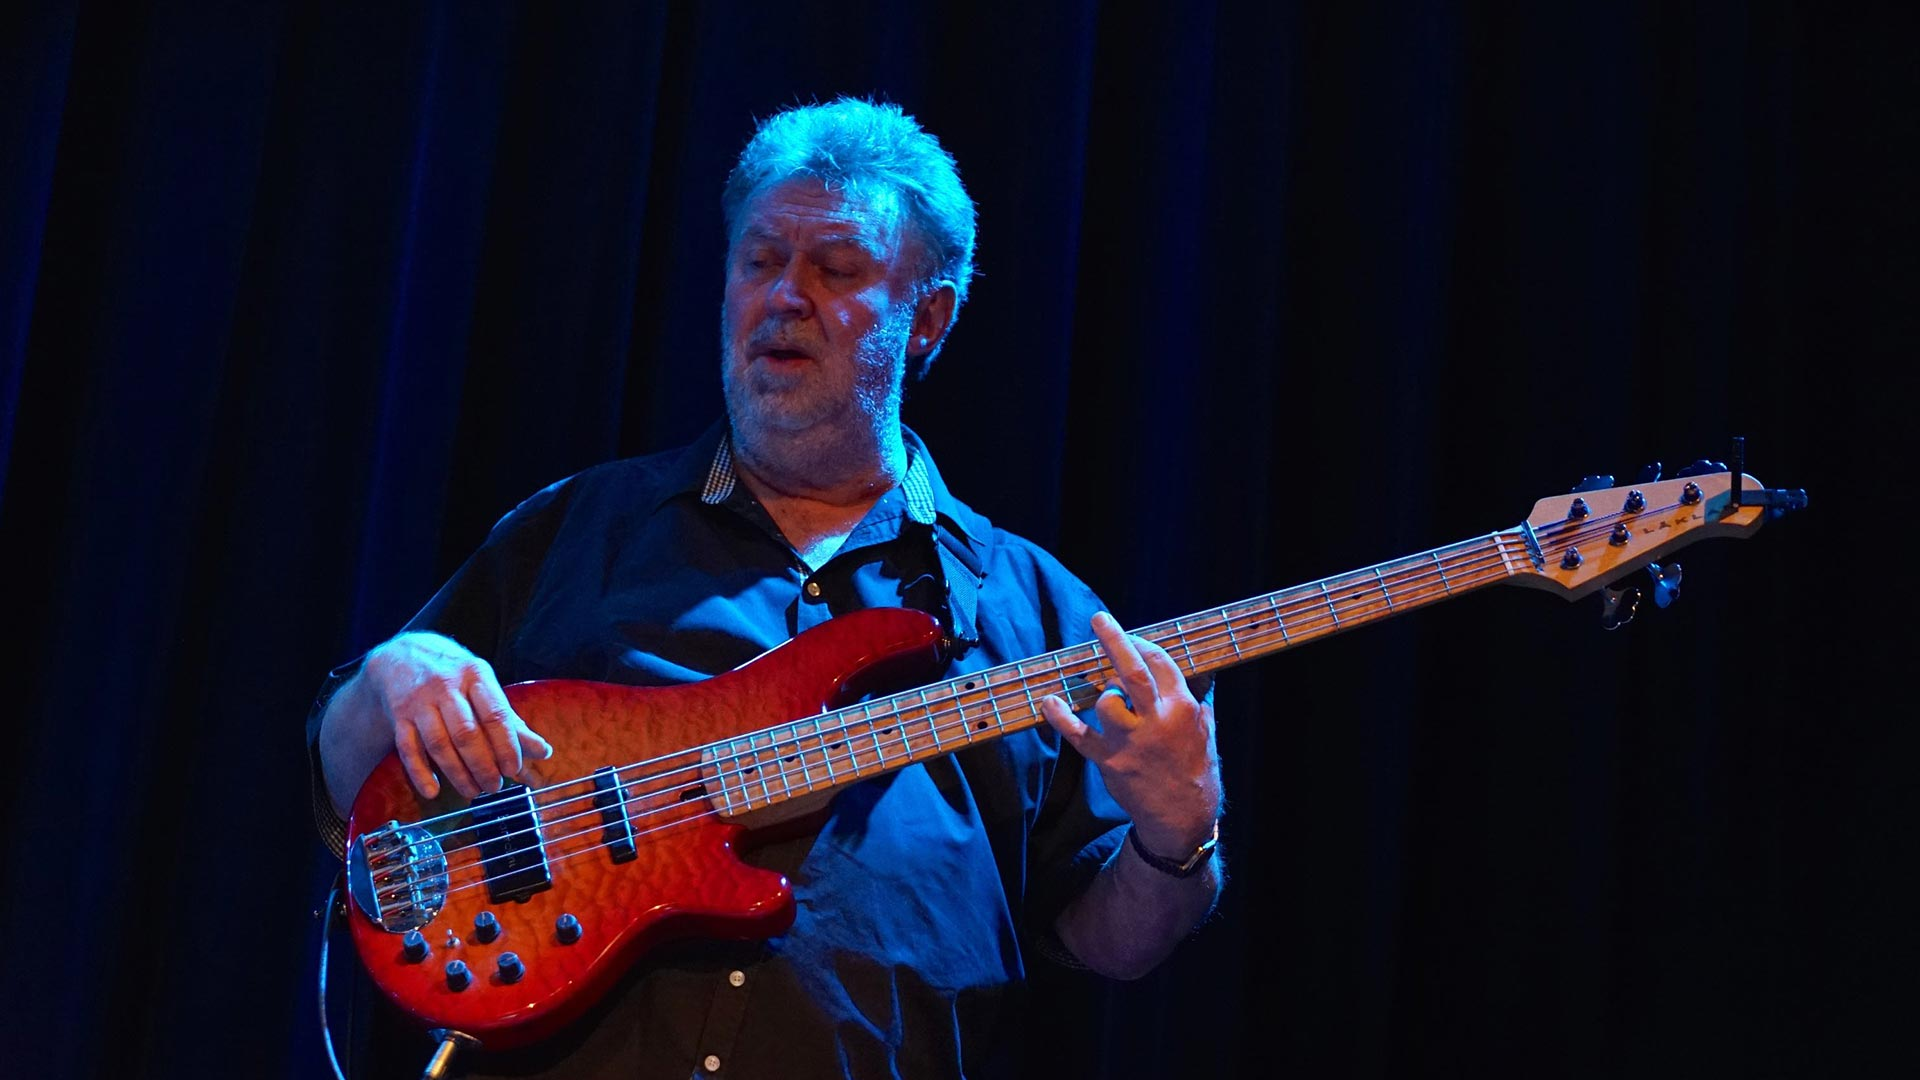 Neil Simpson plays Laklan 5-string bass guitar